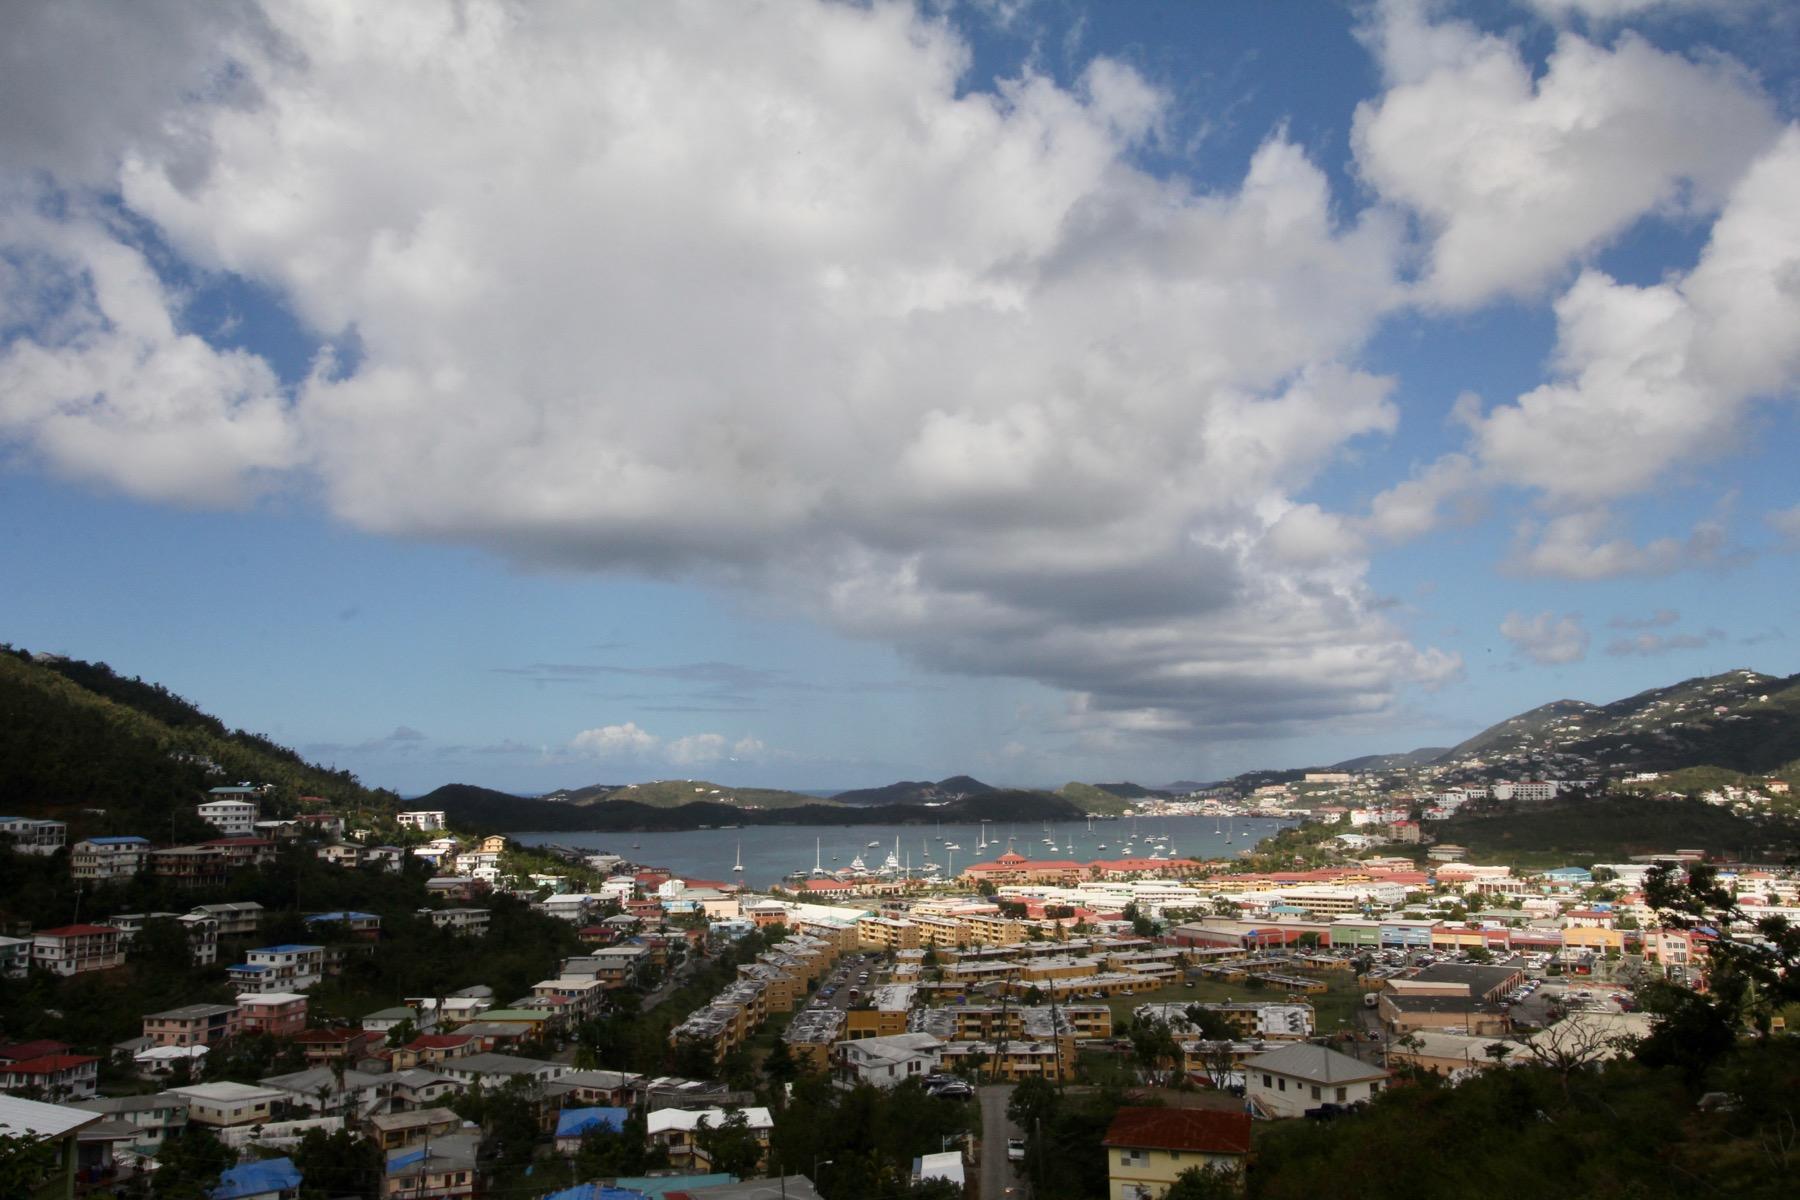 beautiful town/harbor view